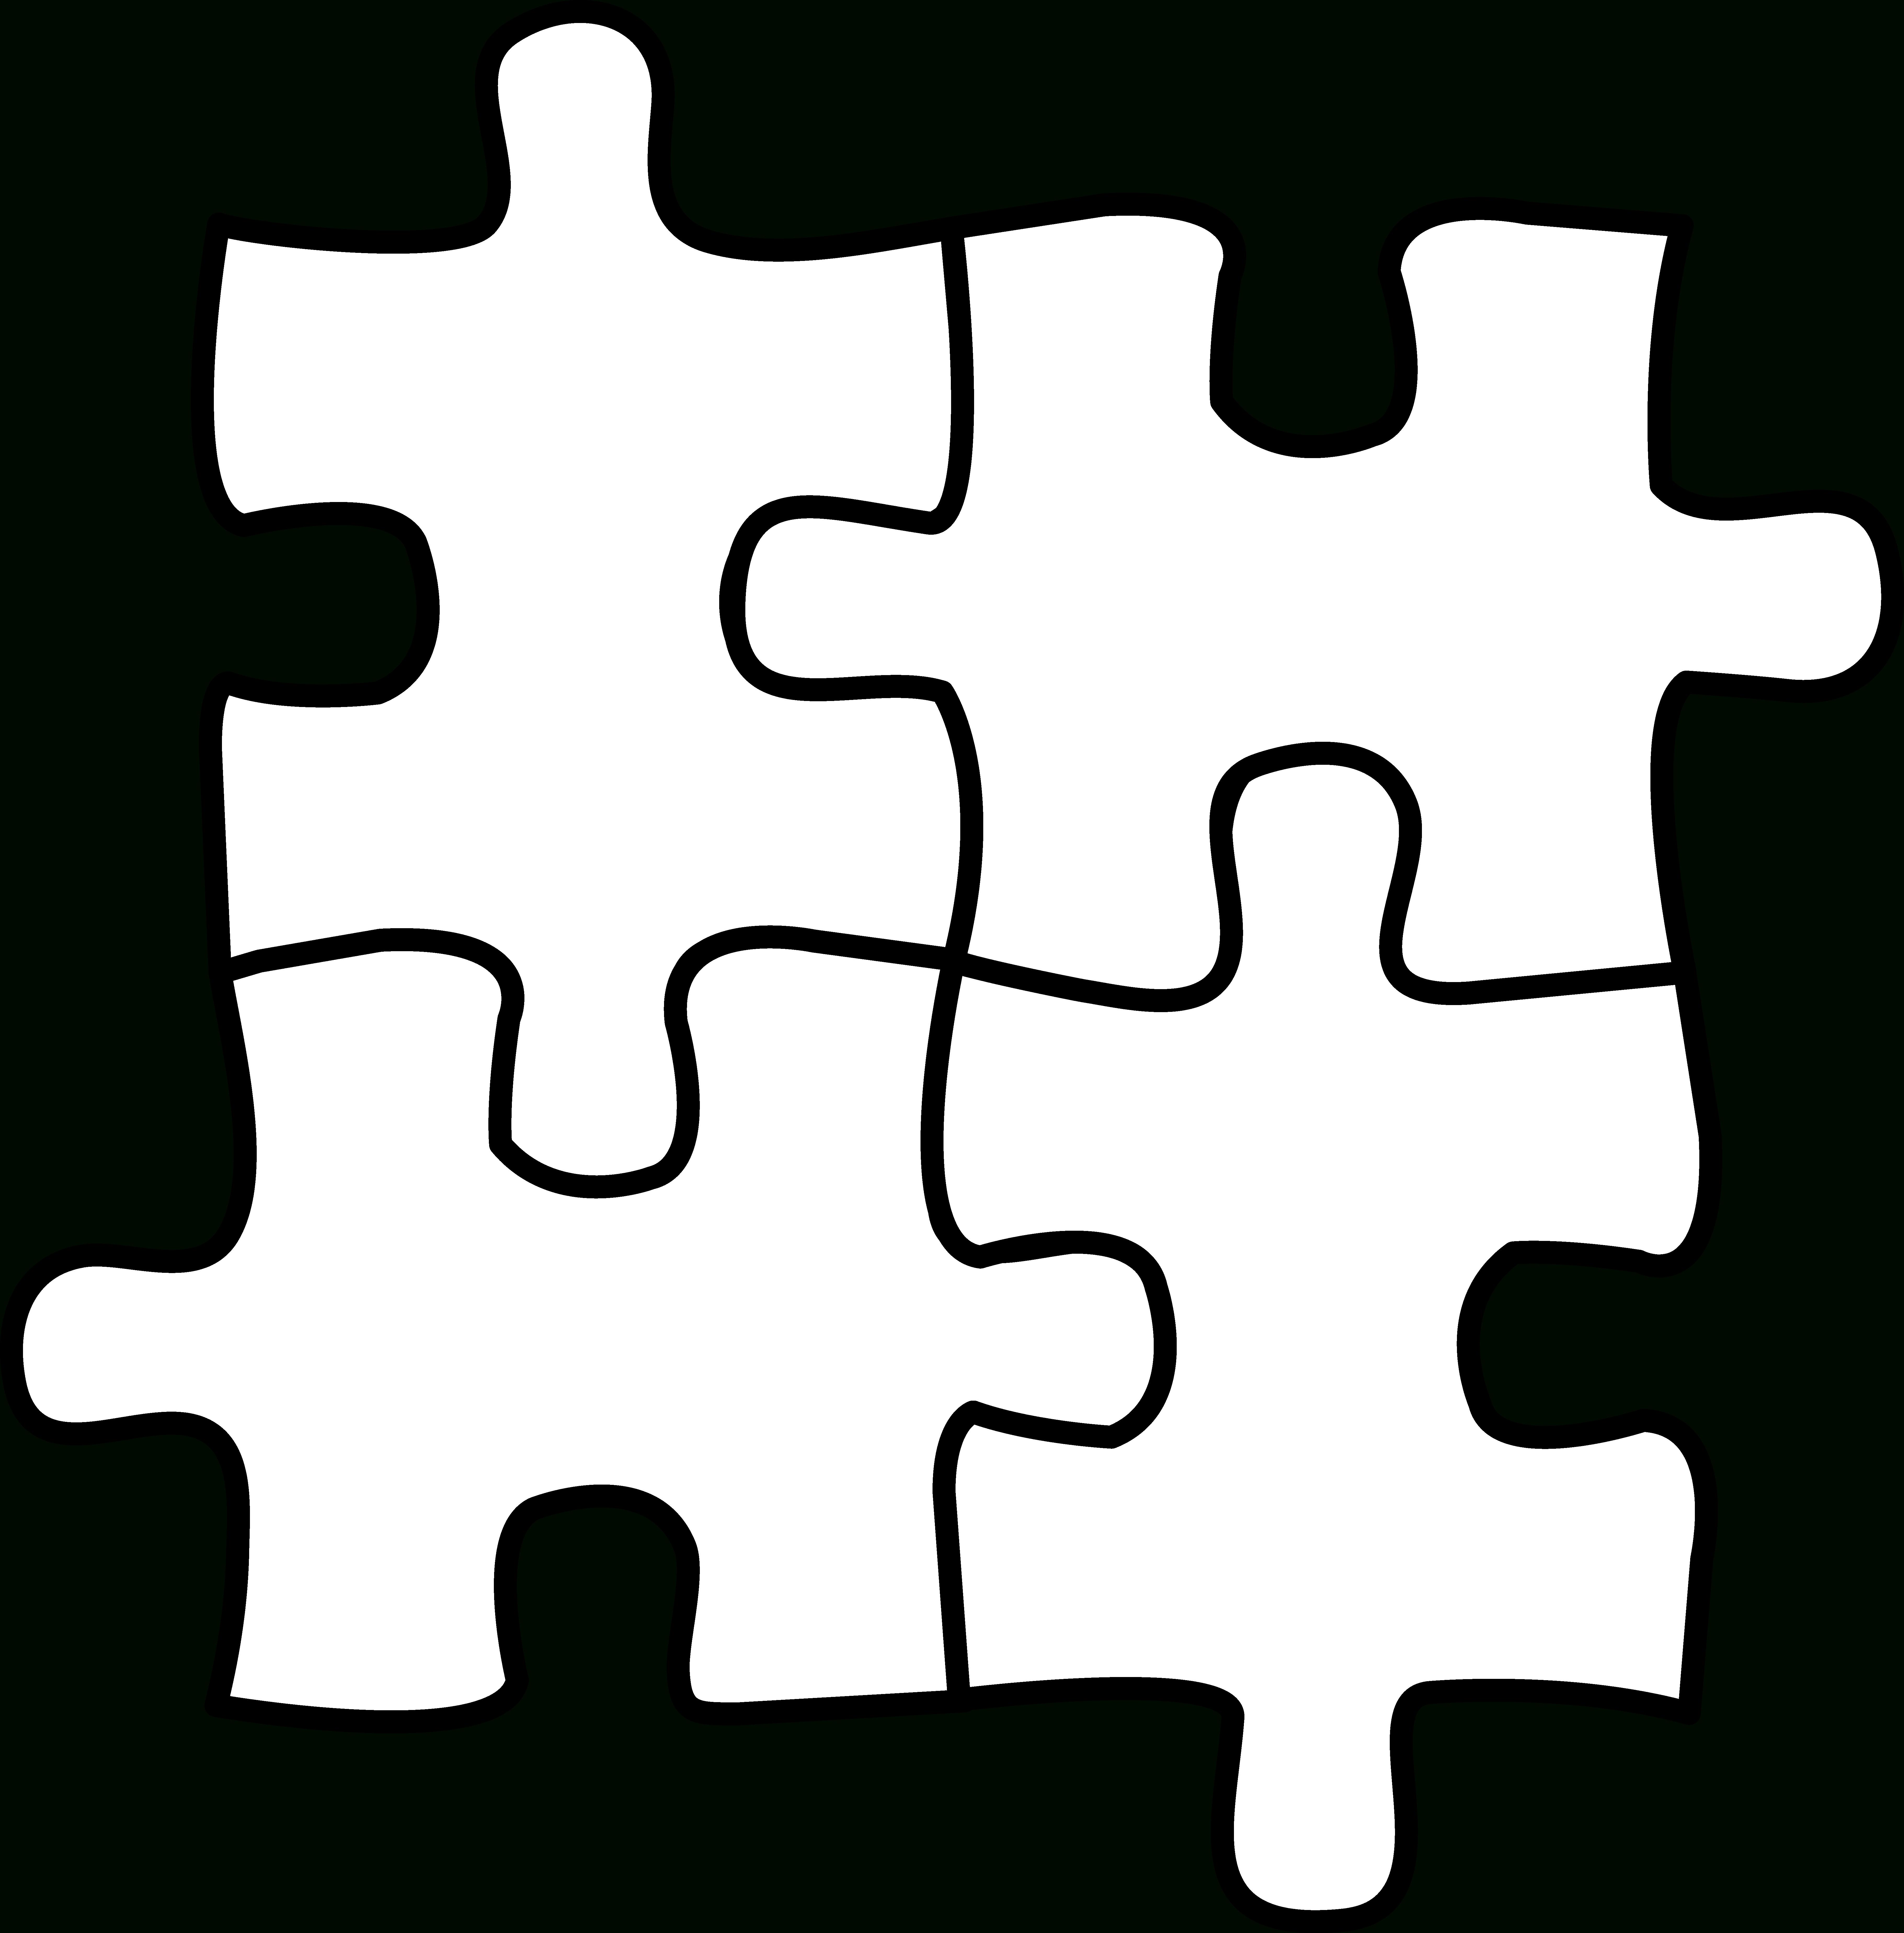 Autism Puzzle Piece Coloring Page - Coloring Home - Printable Puzzle Piece Coloring Pages